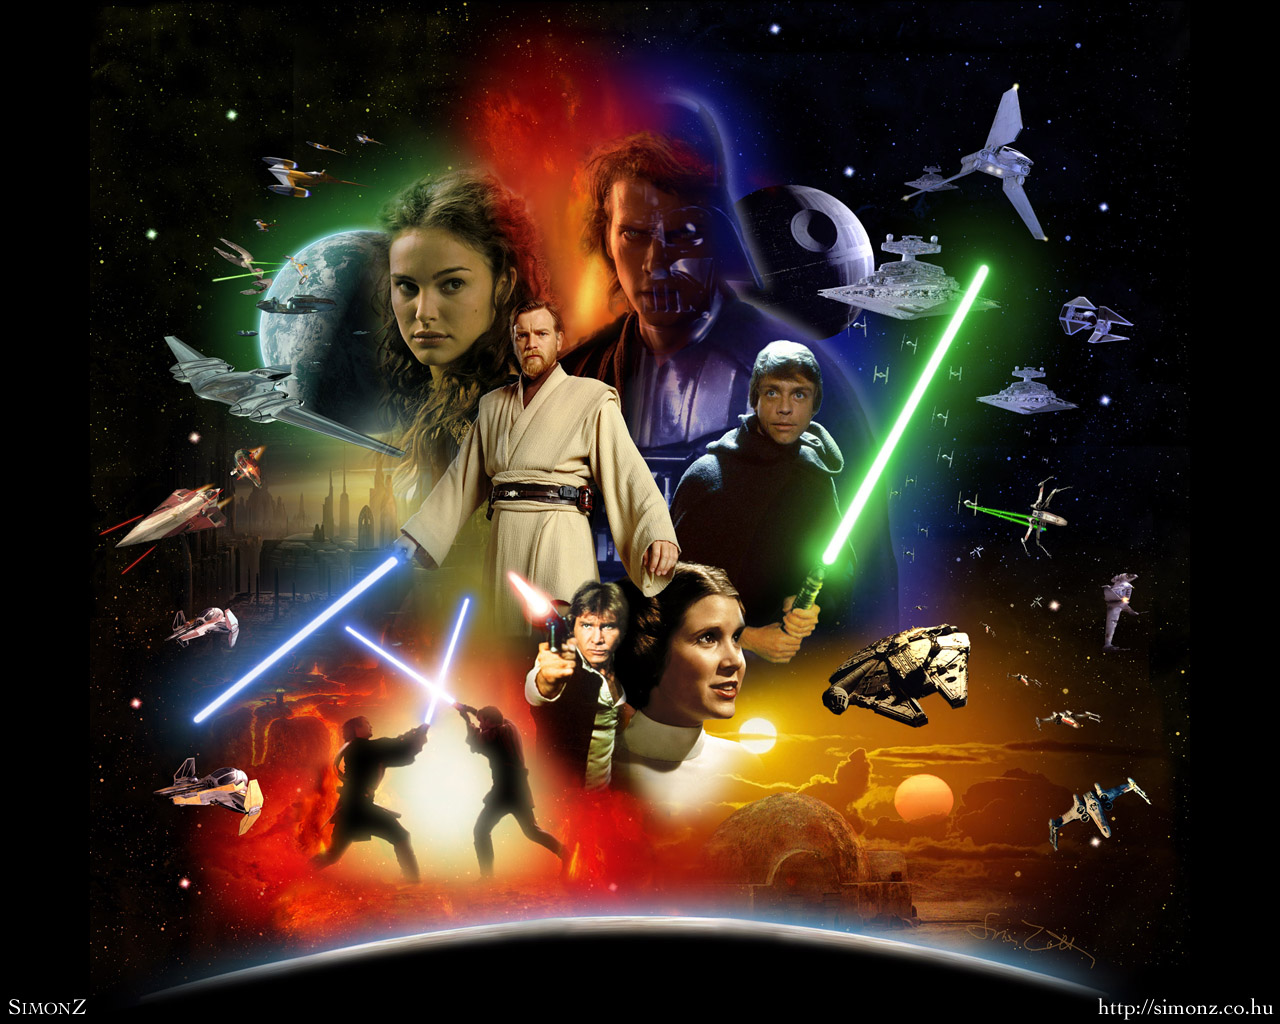 Free Download Wallpapers Downloads Hhg1216 Star Wars Wallpaper